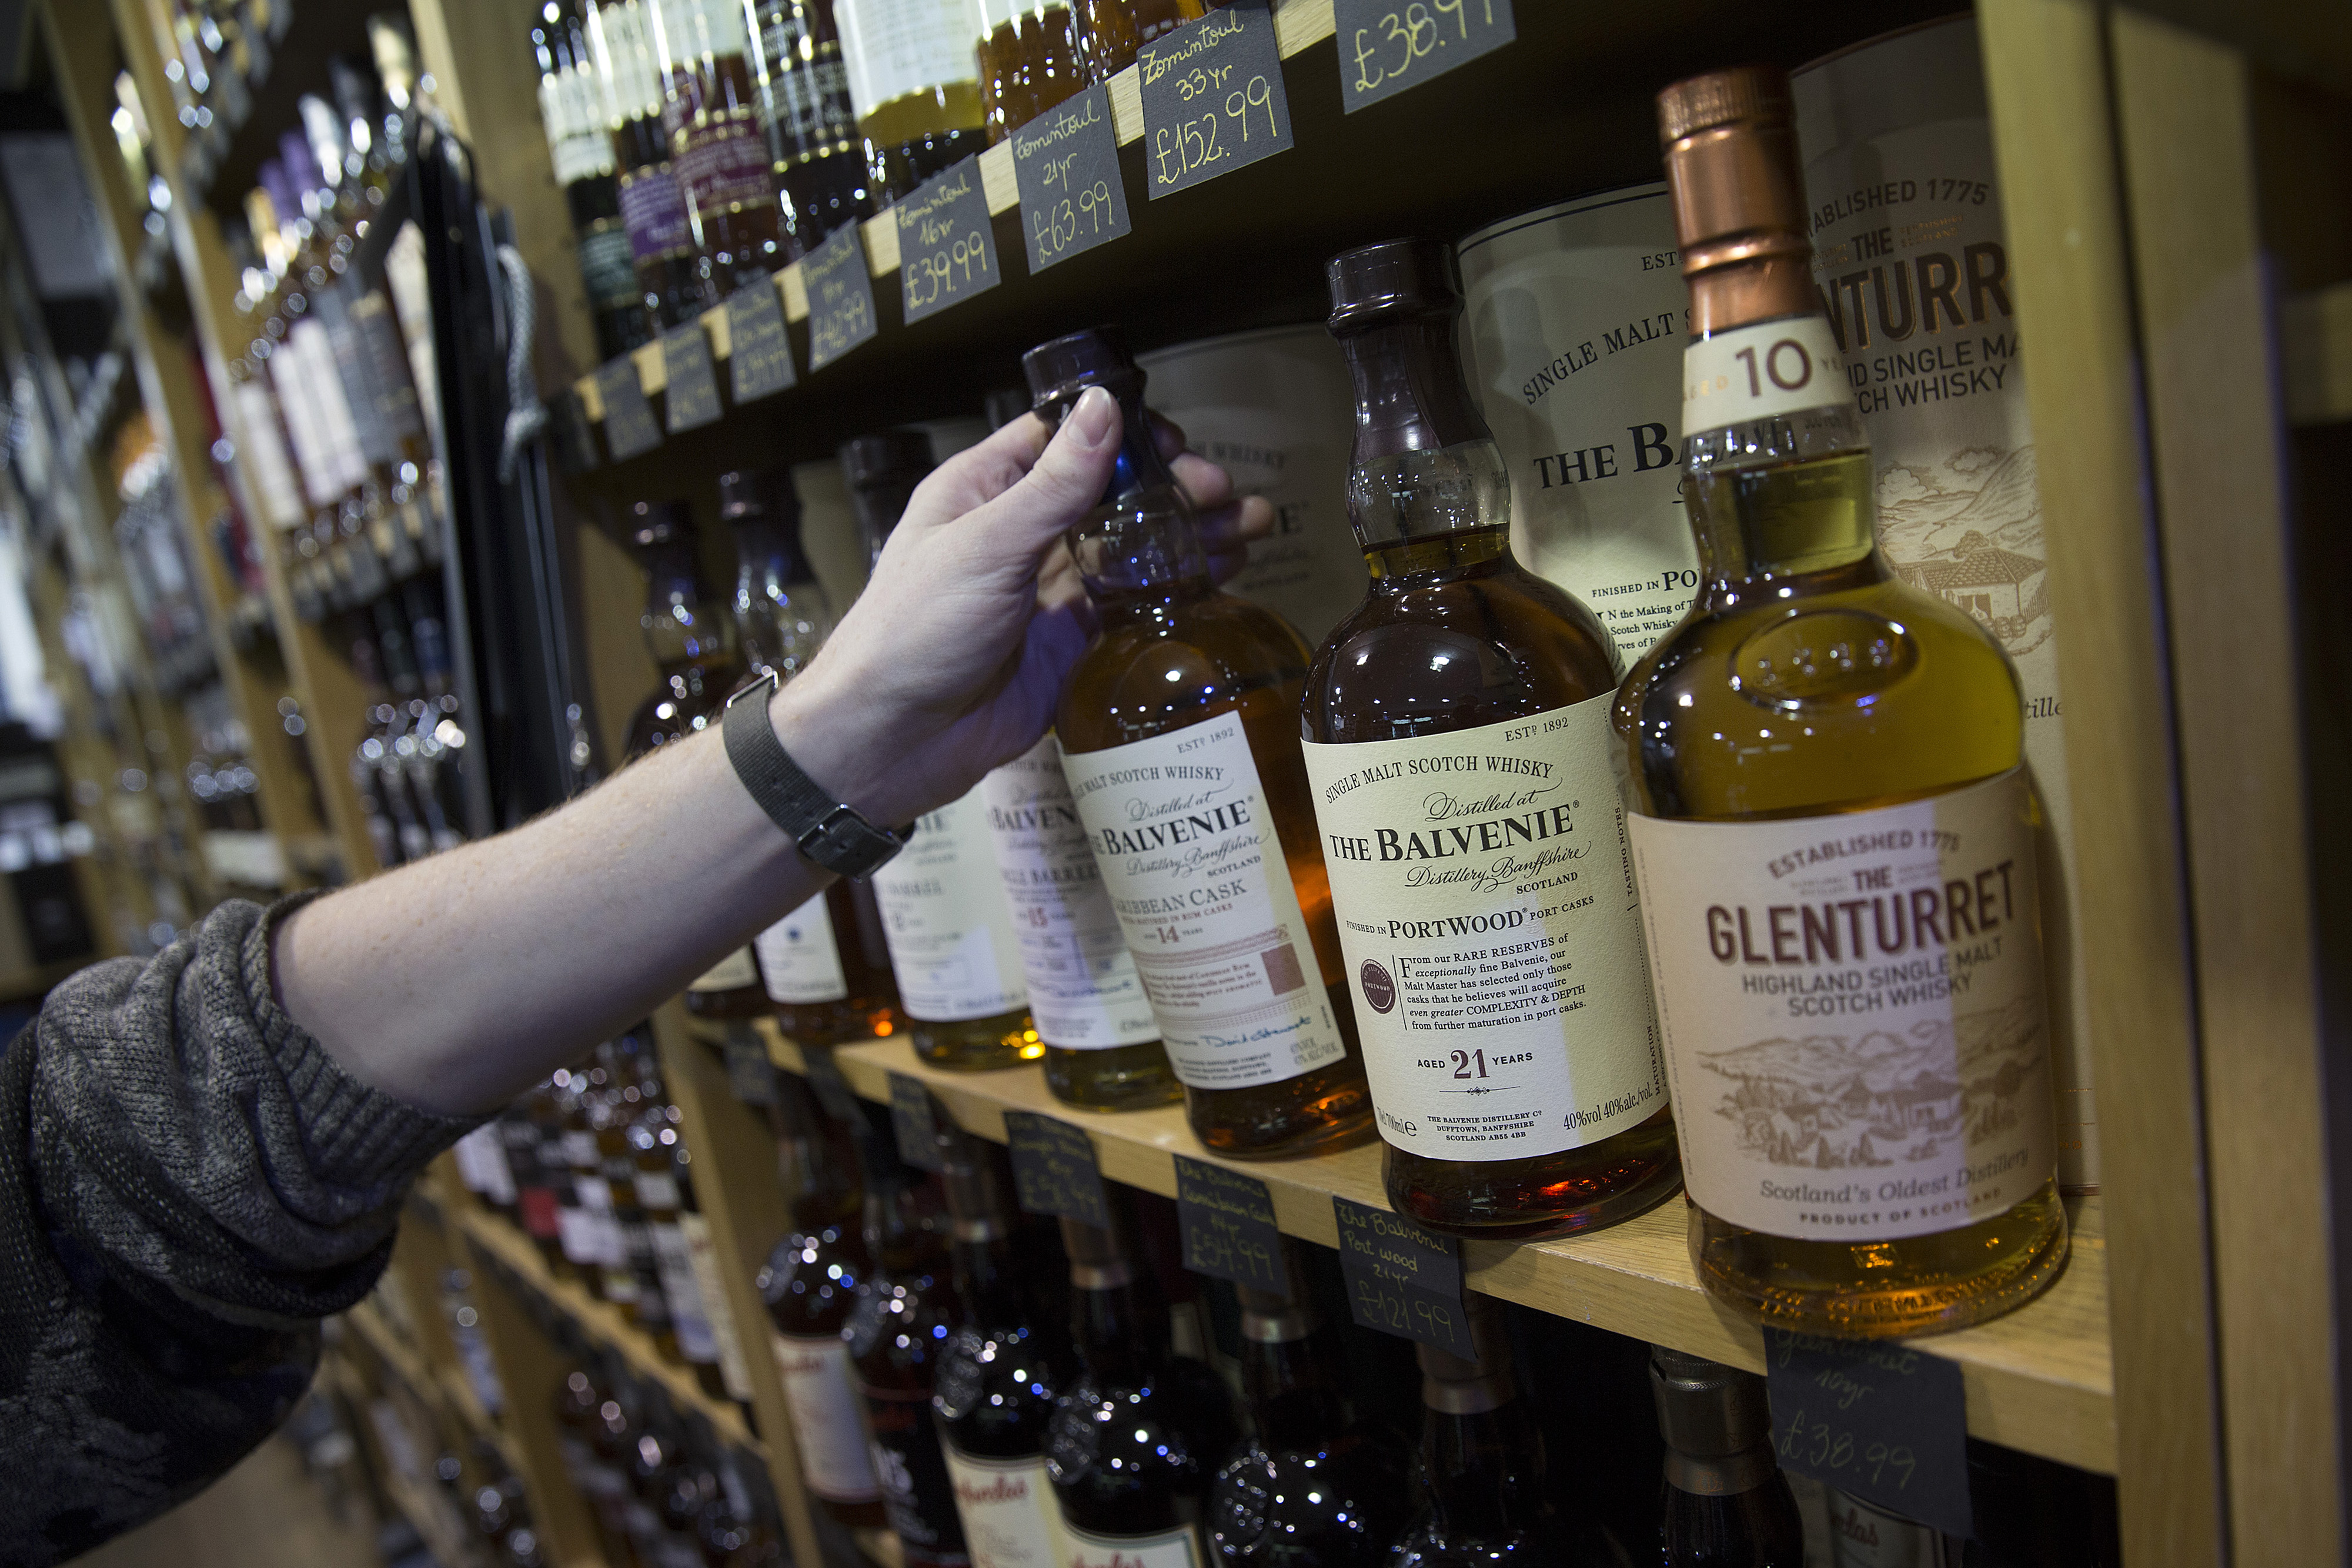 A whisky store in Edinburgh, Scotland,  seen in Jan. 2014.